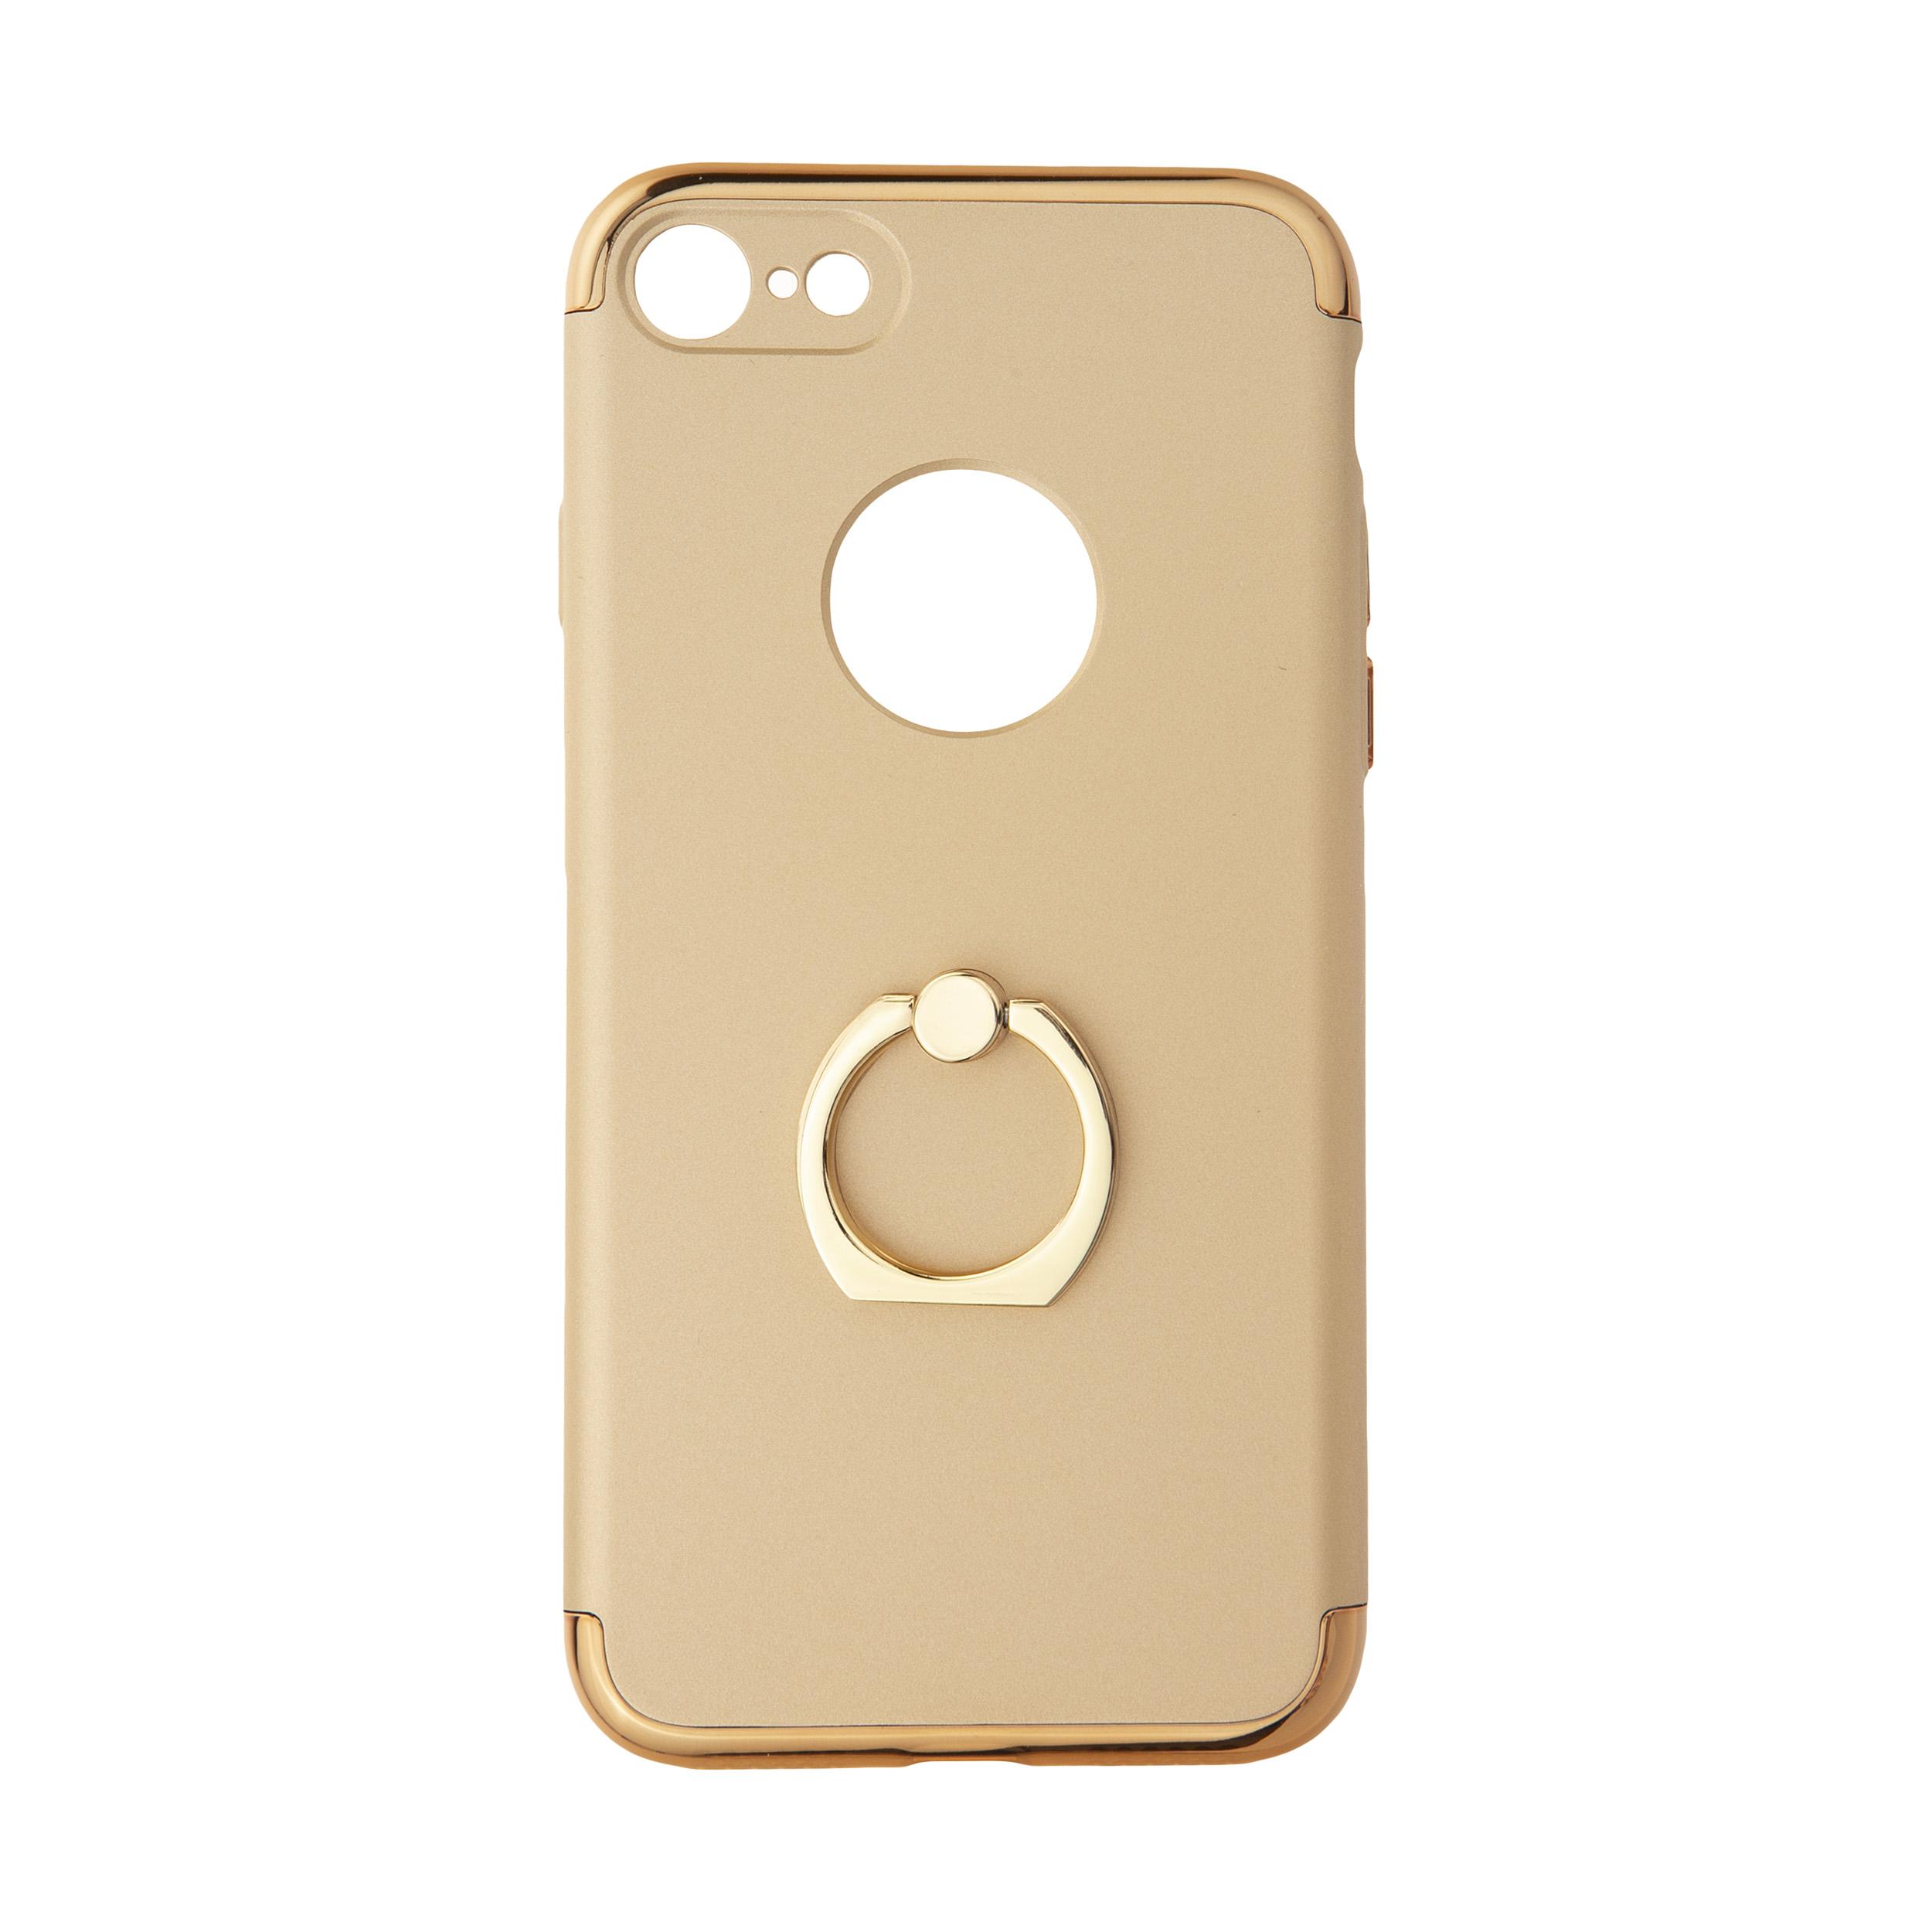 کاور جوی روم مدل JR-BP215 مناسب برای گوشی موبایل اپل iPhone 7